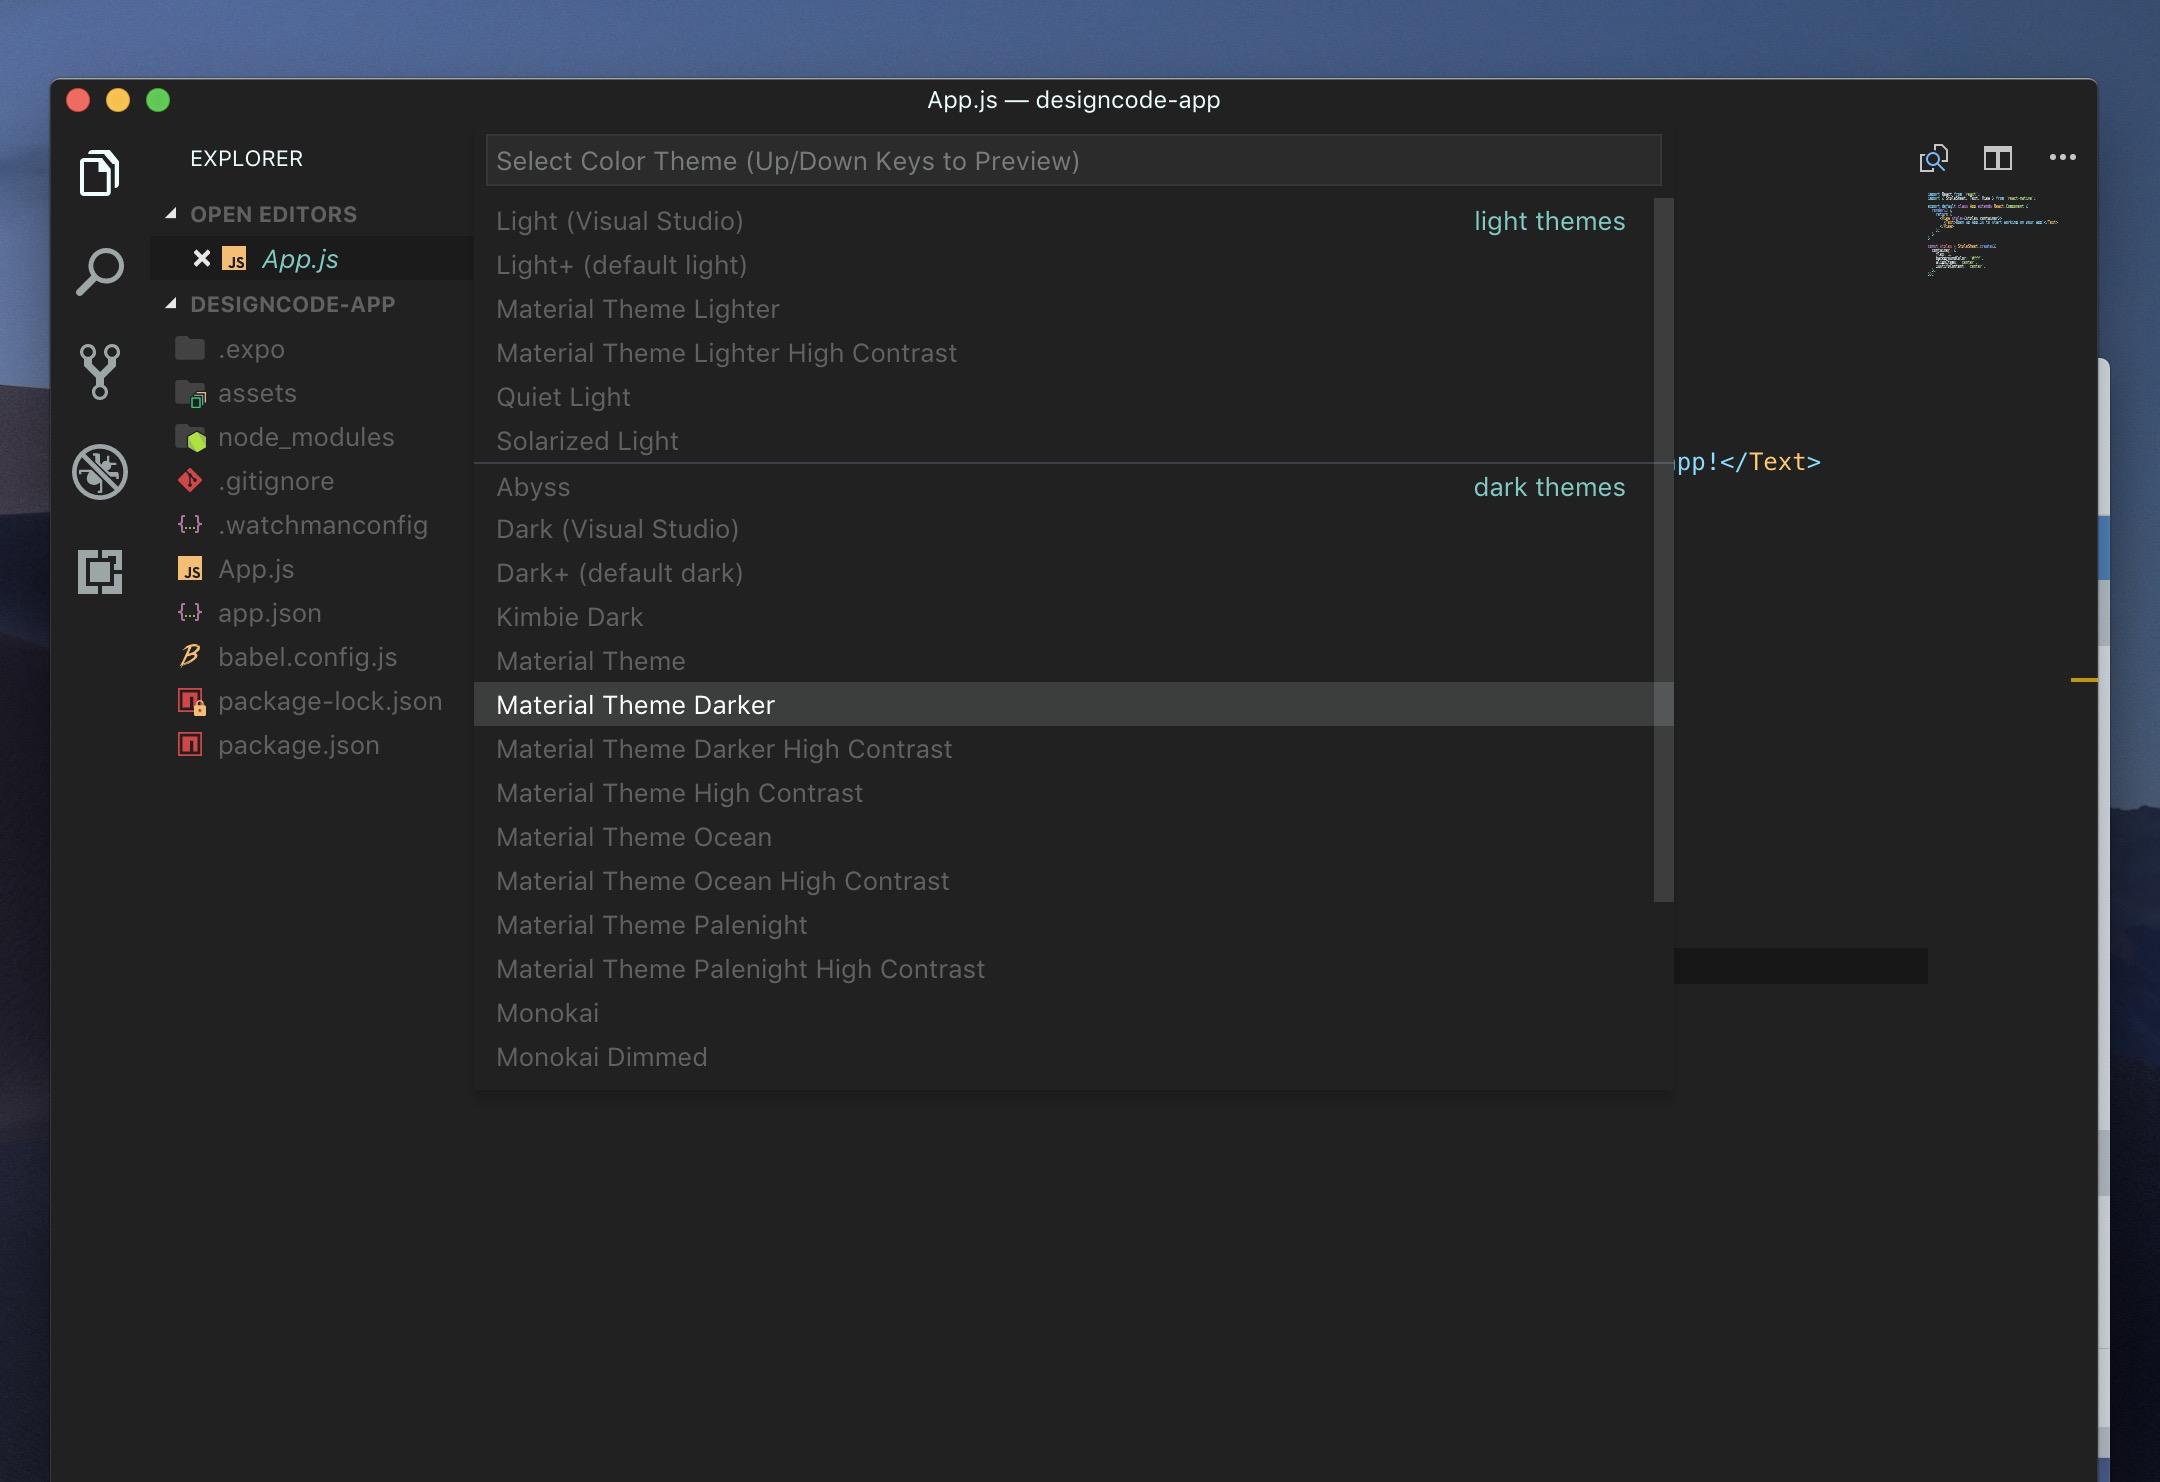 React Native for Designers - Design+Code